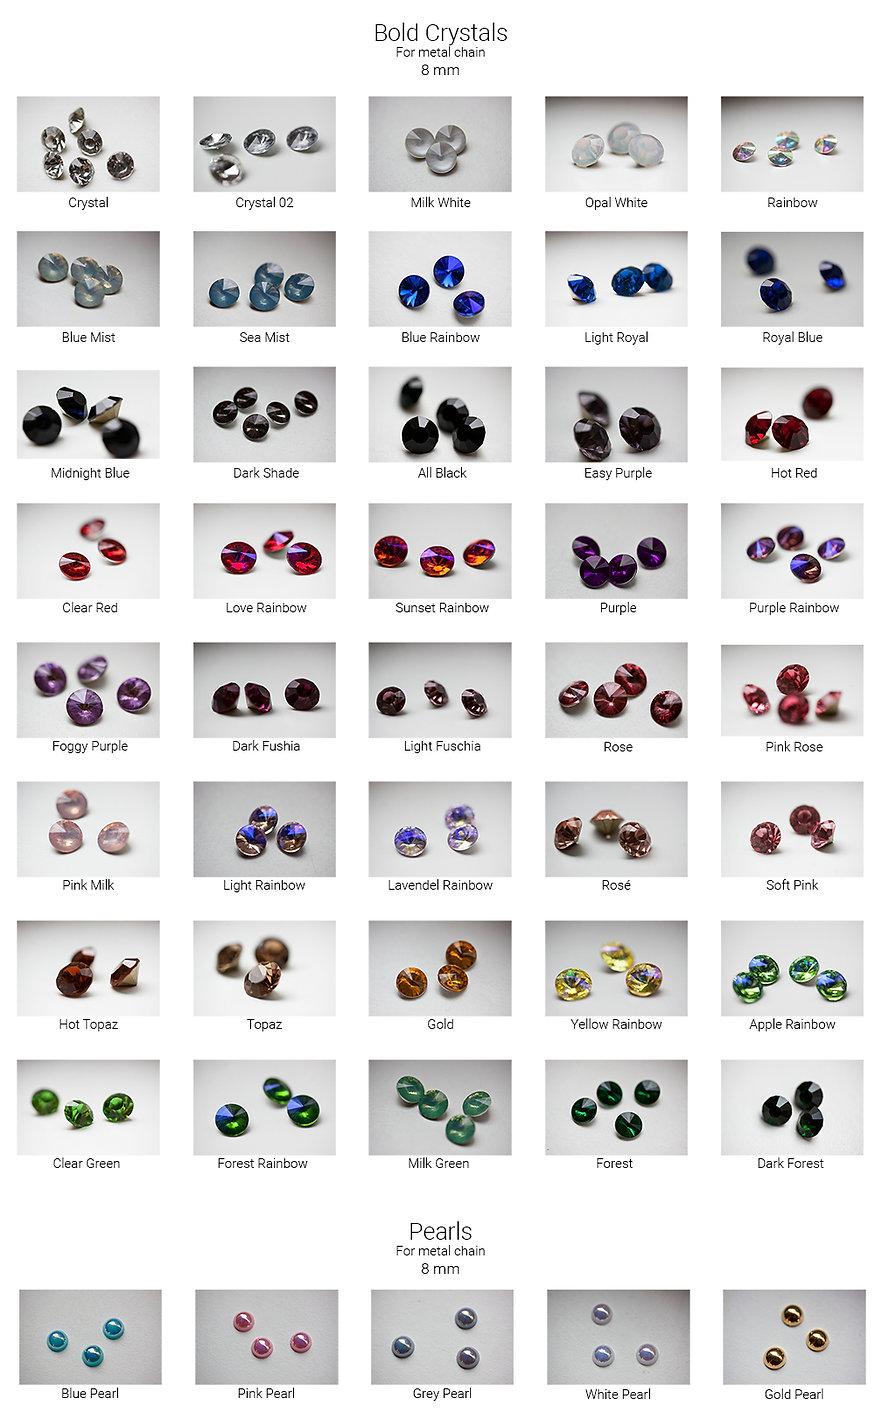 crystals-pearls.jpg